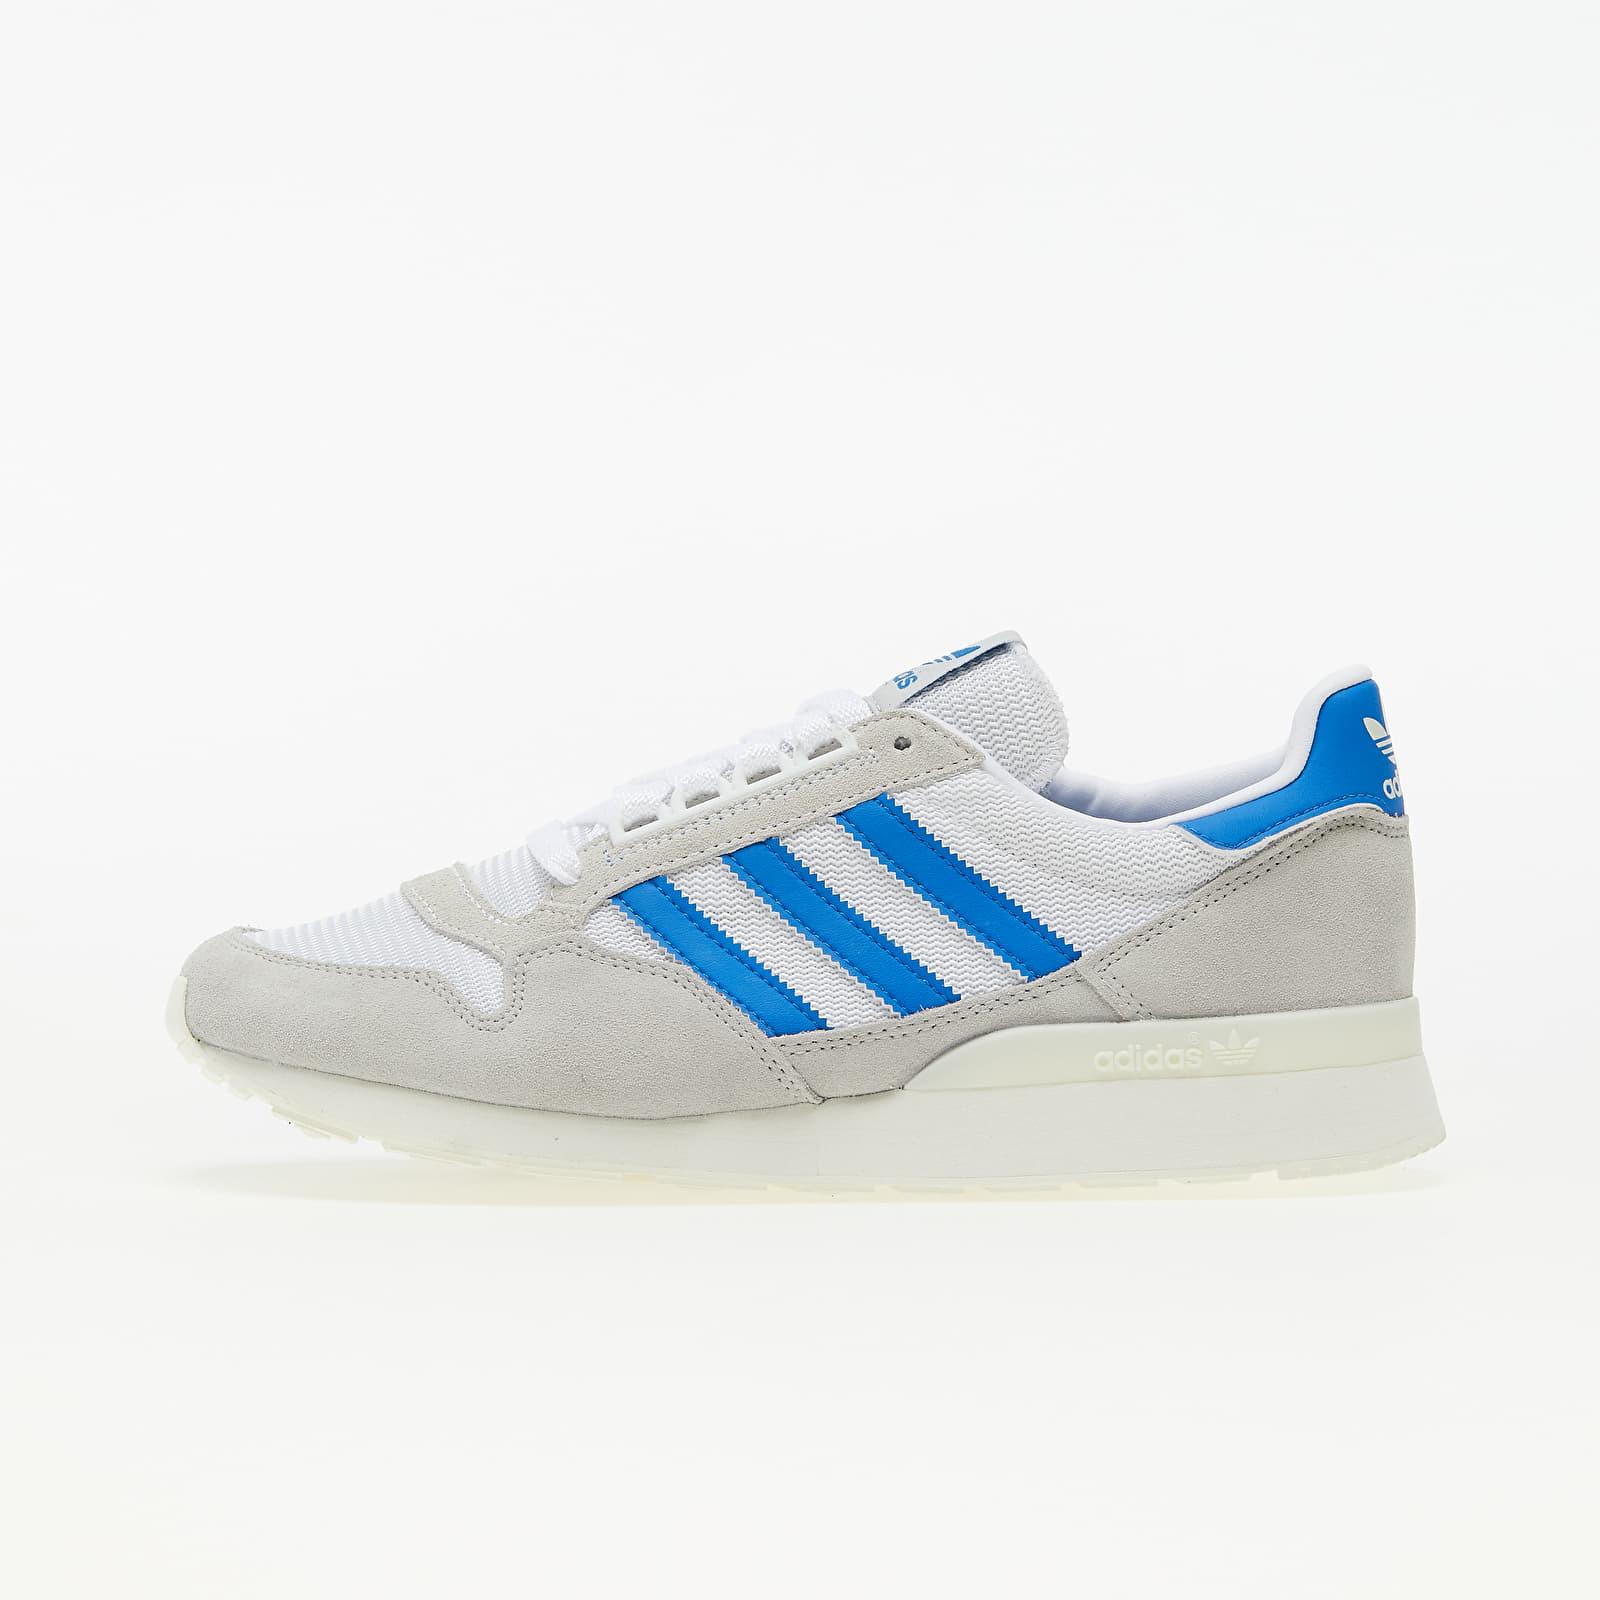 adidas ZX 500 Ftw White/ Blue Bird/ Off White EUR 46 2/3